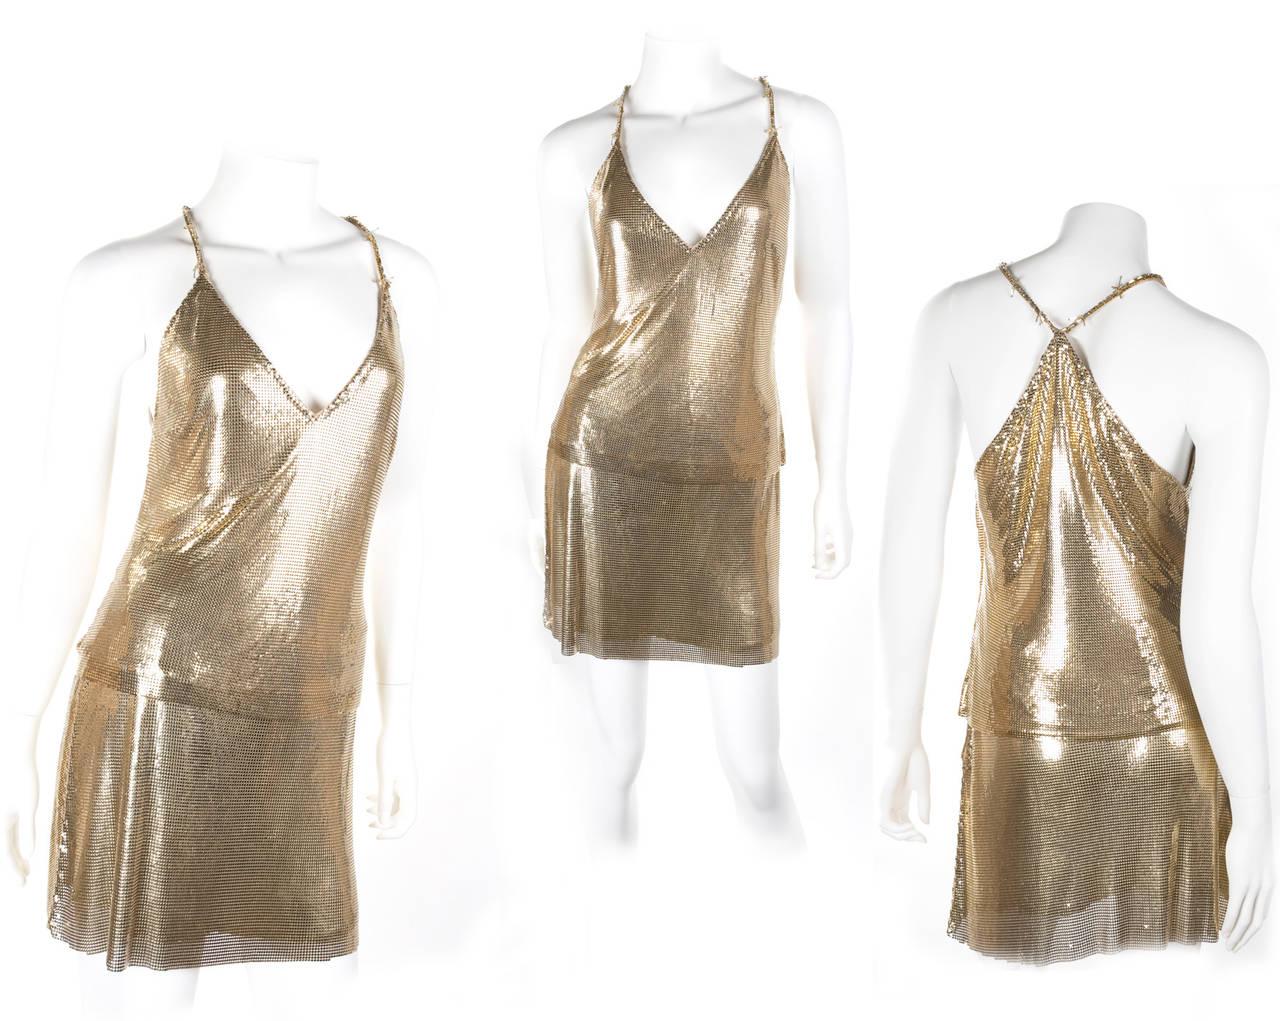 1982 Gianni Versace Couture Metal Mesh Oroton Top and Skirt 2